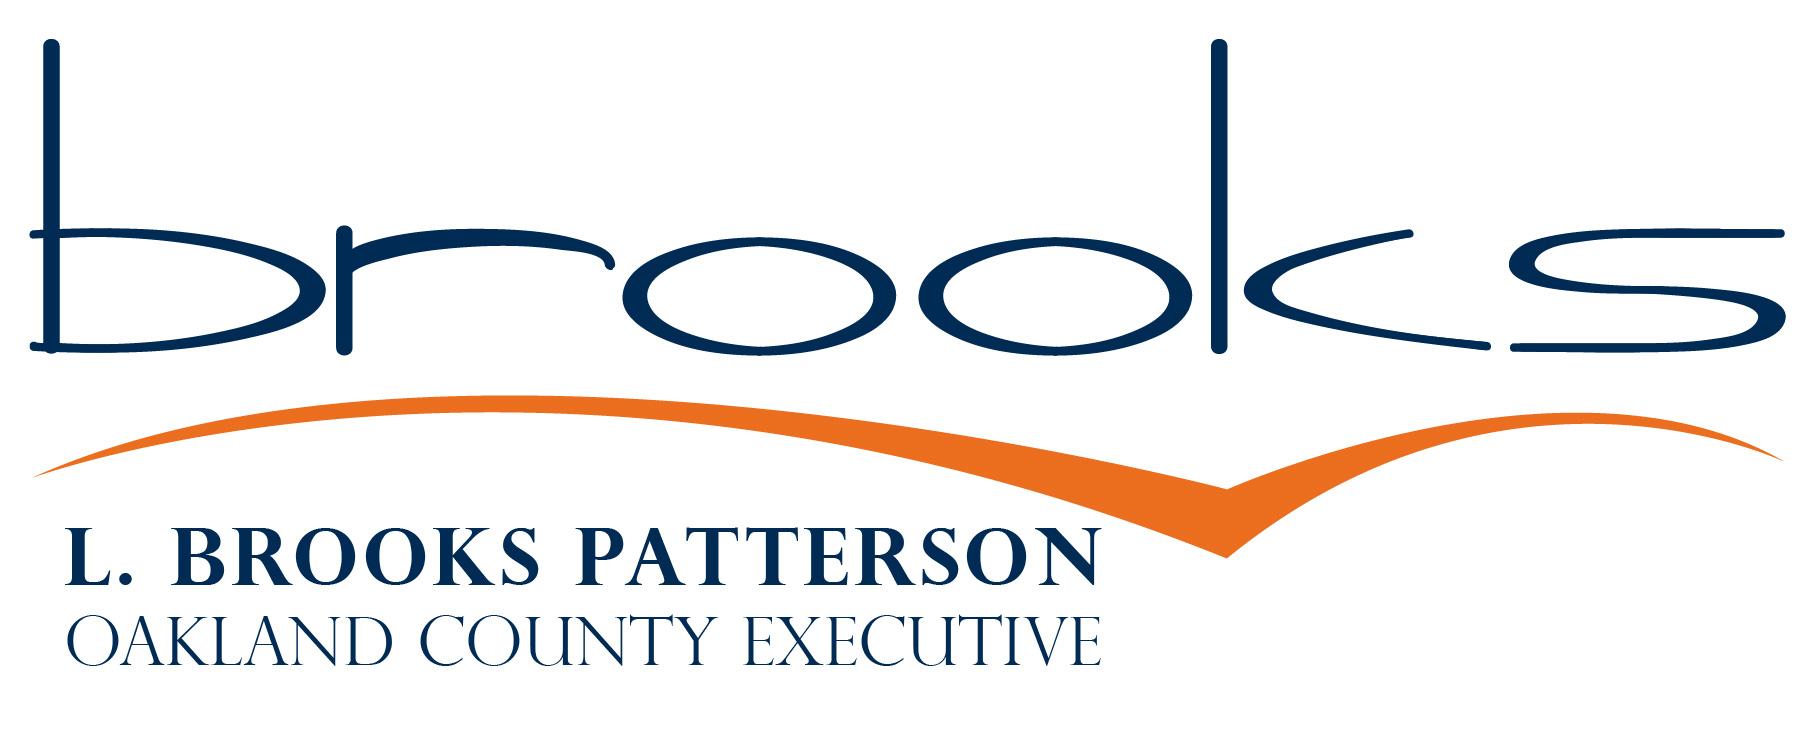 Brooks logo_LBP-01